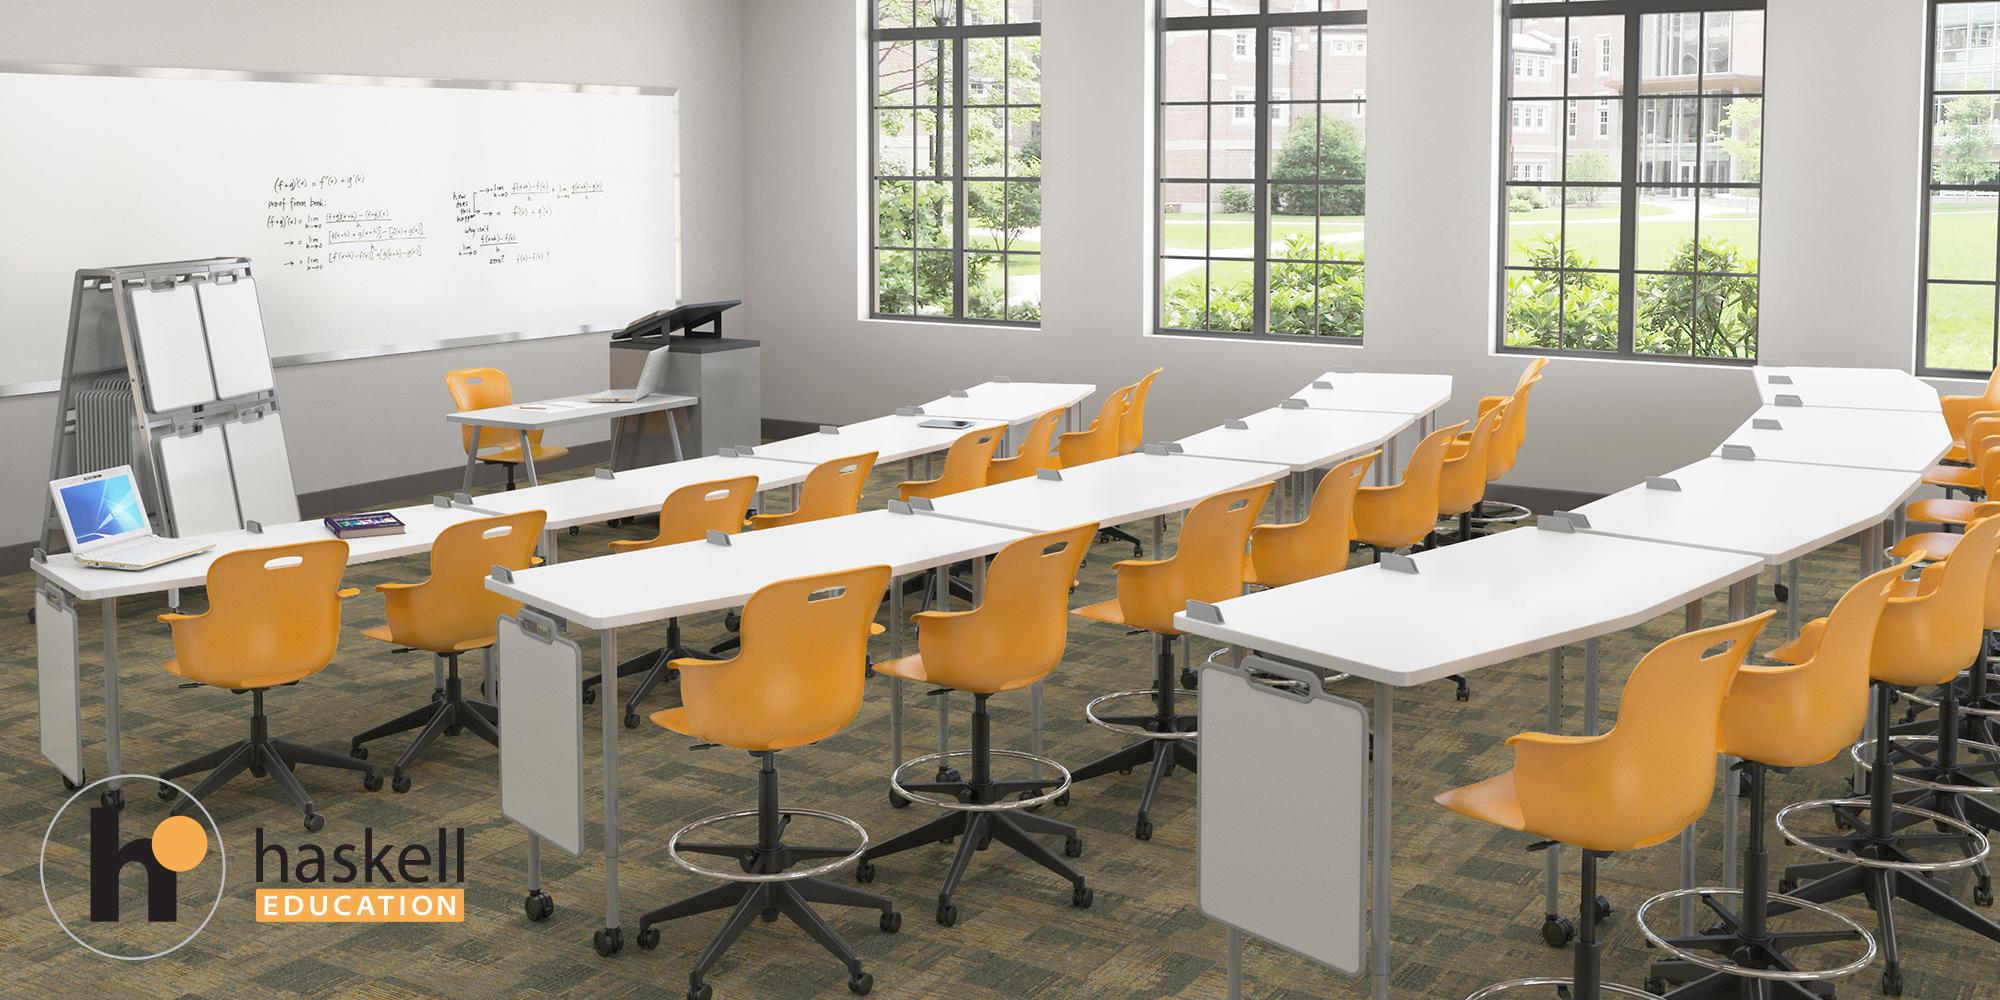 Stadium Seating Classroom FIVE STAR AngleShot w Carpet